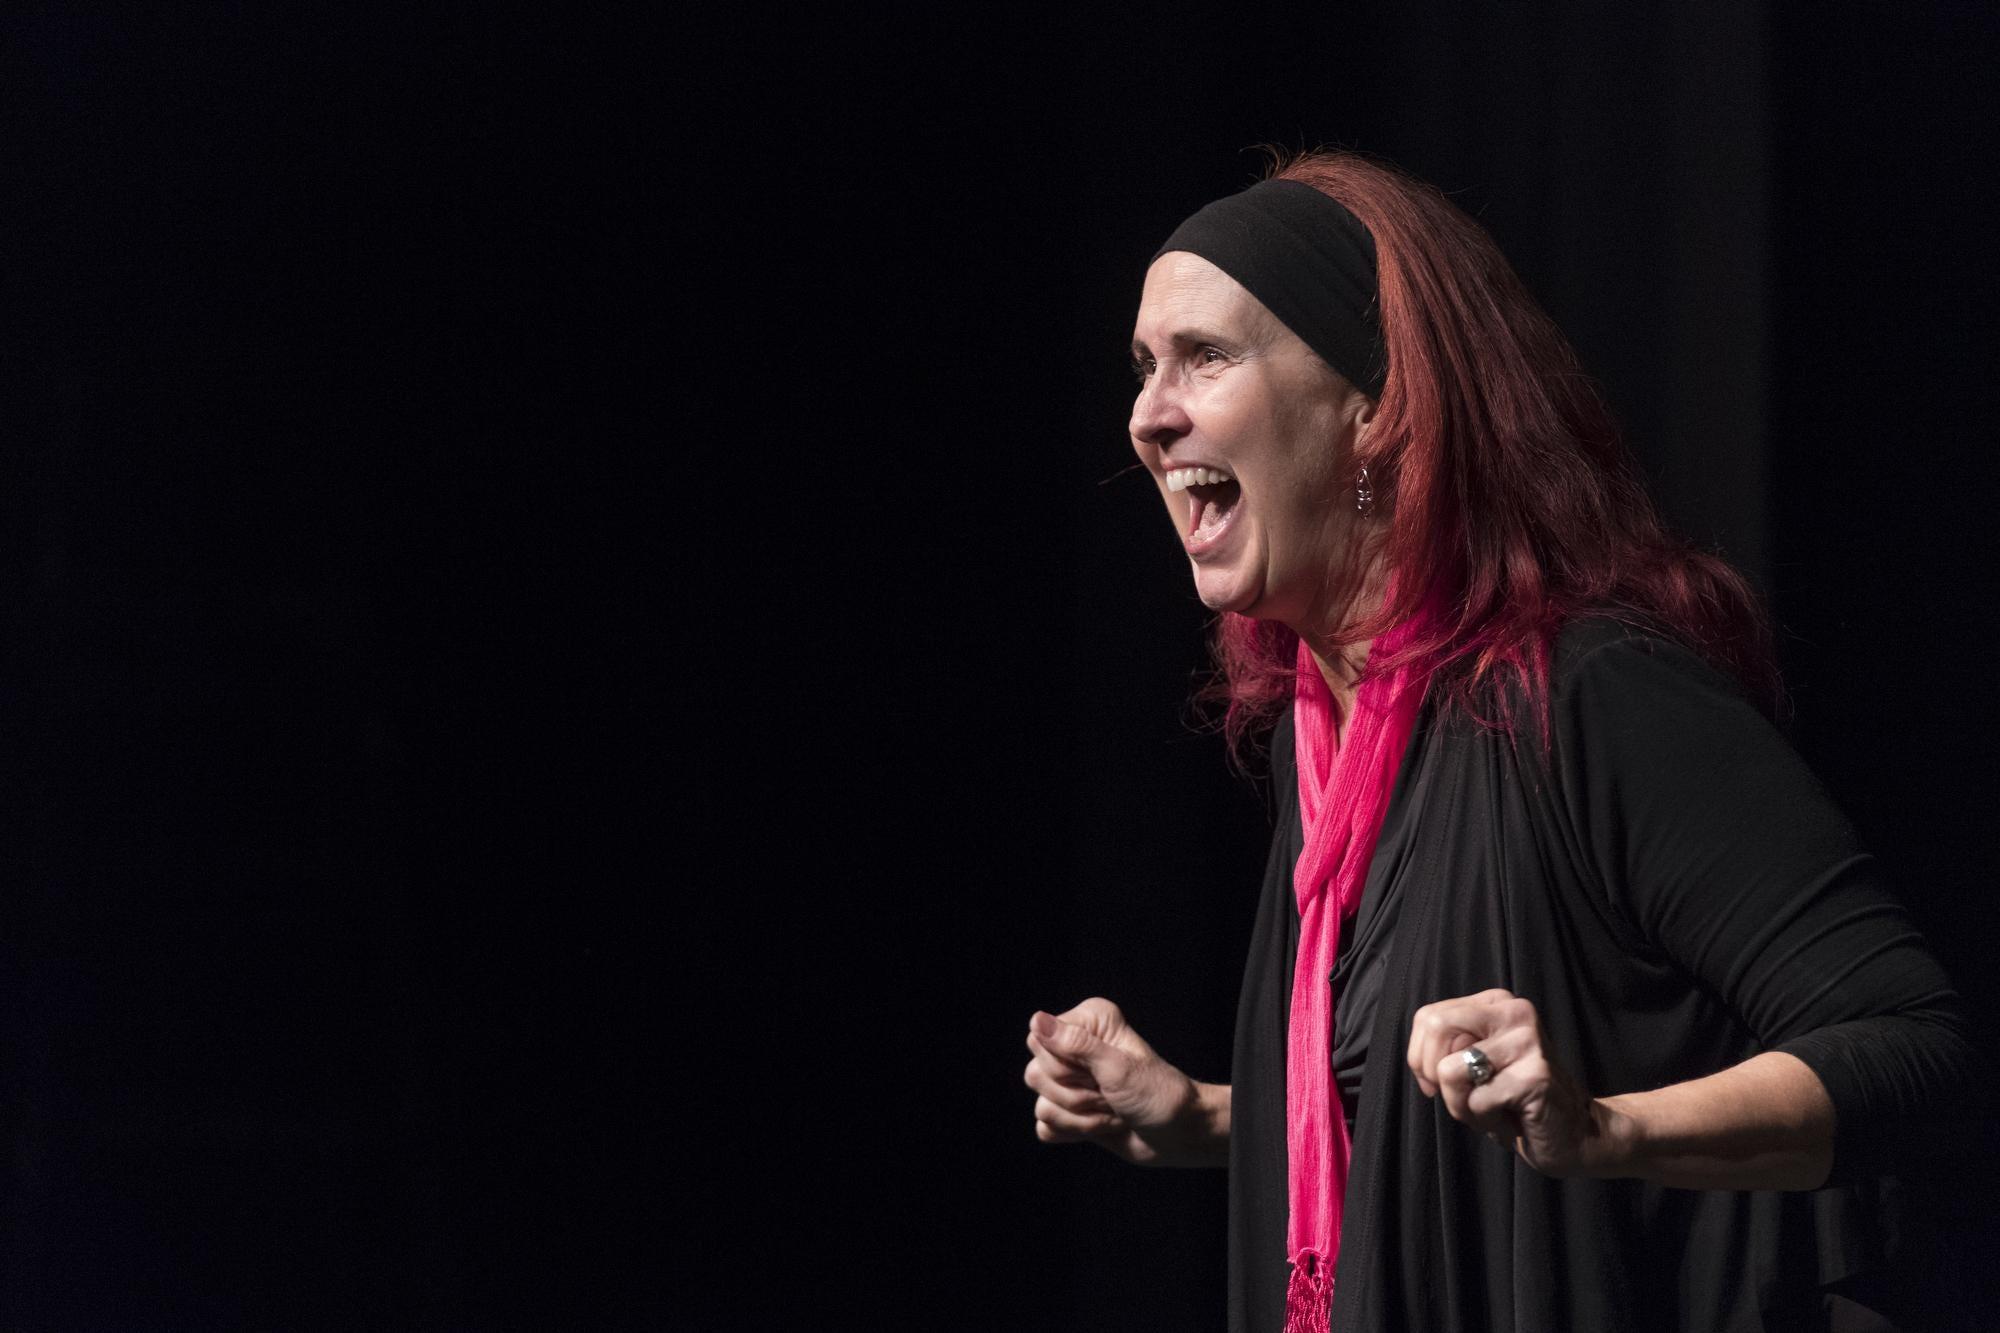 The vagina monologues next dc performance